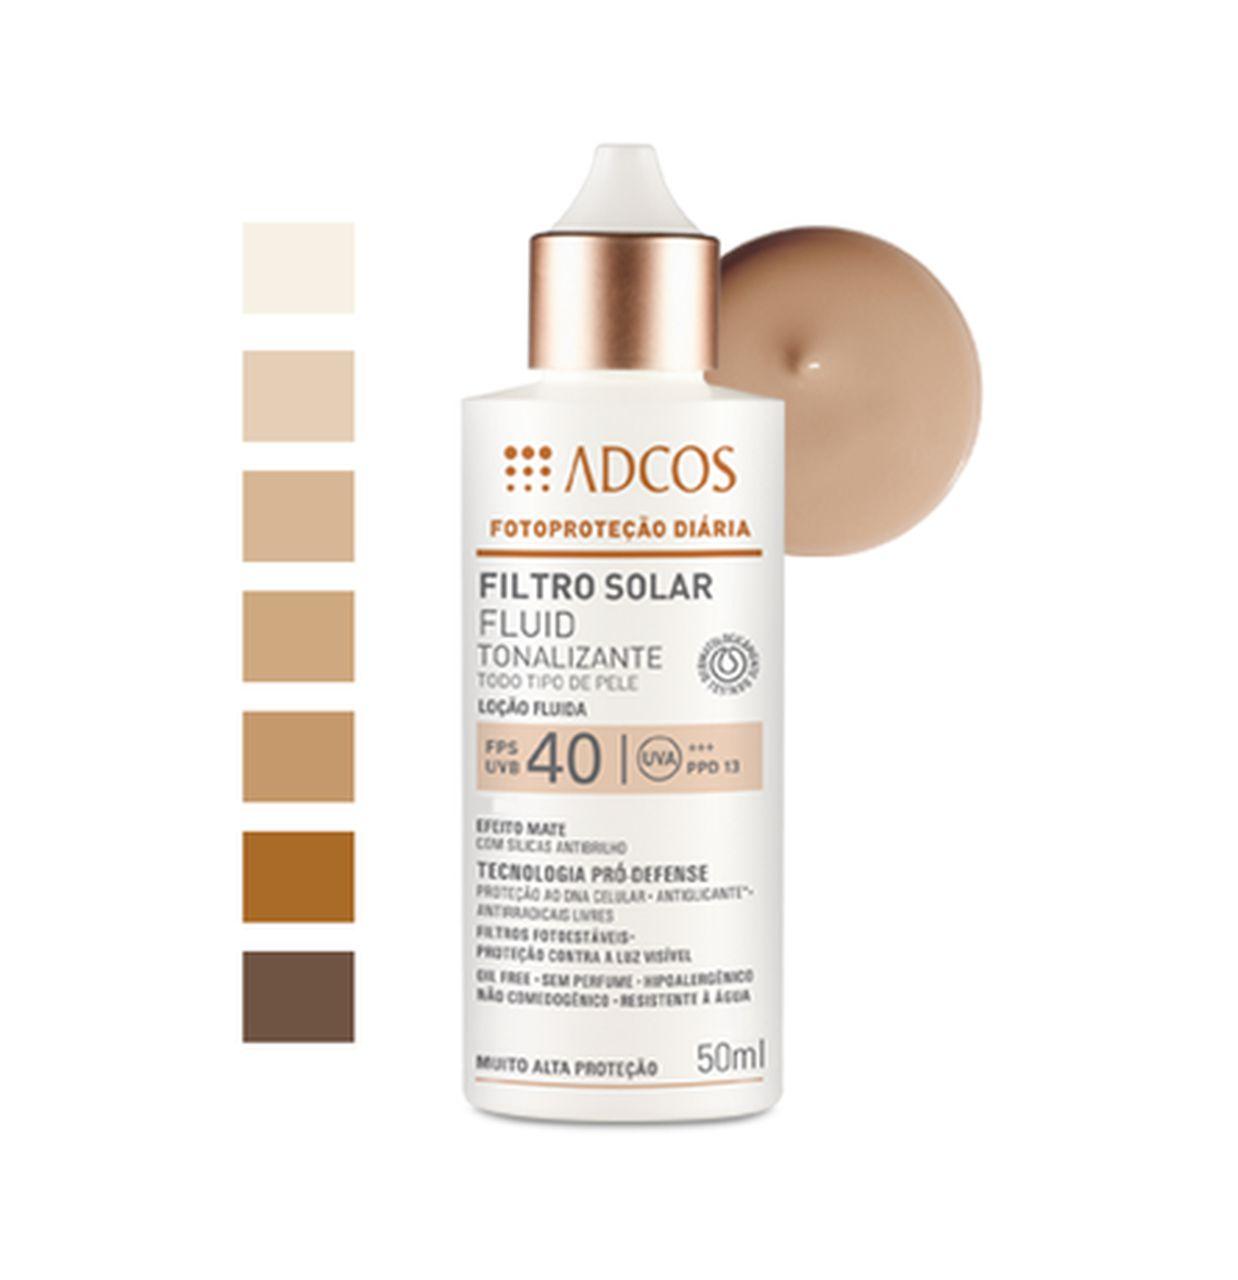 Adcos Filtro Solar Fluid Tonalizante Fps40 - 50ml